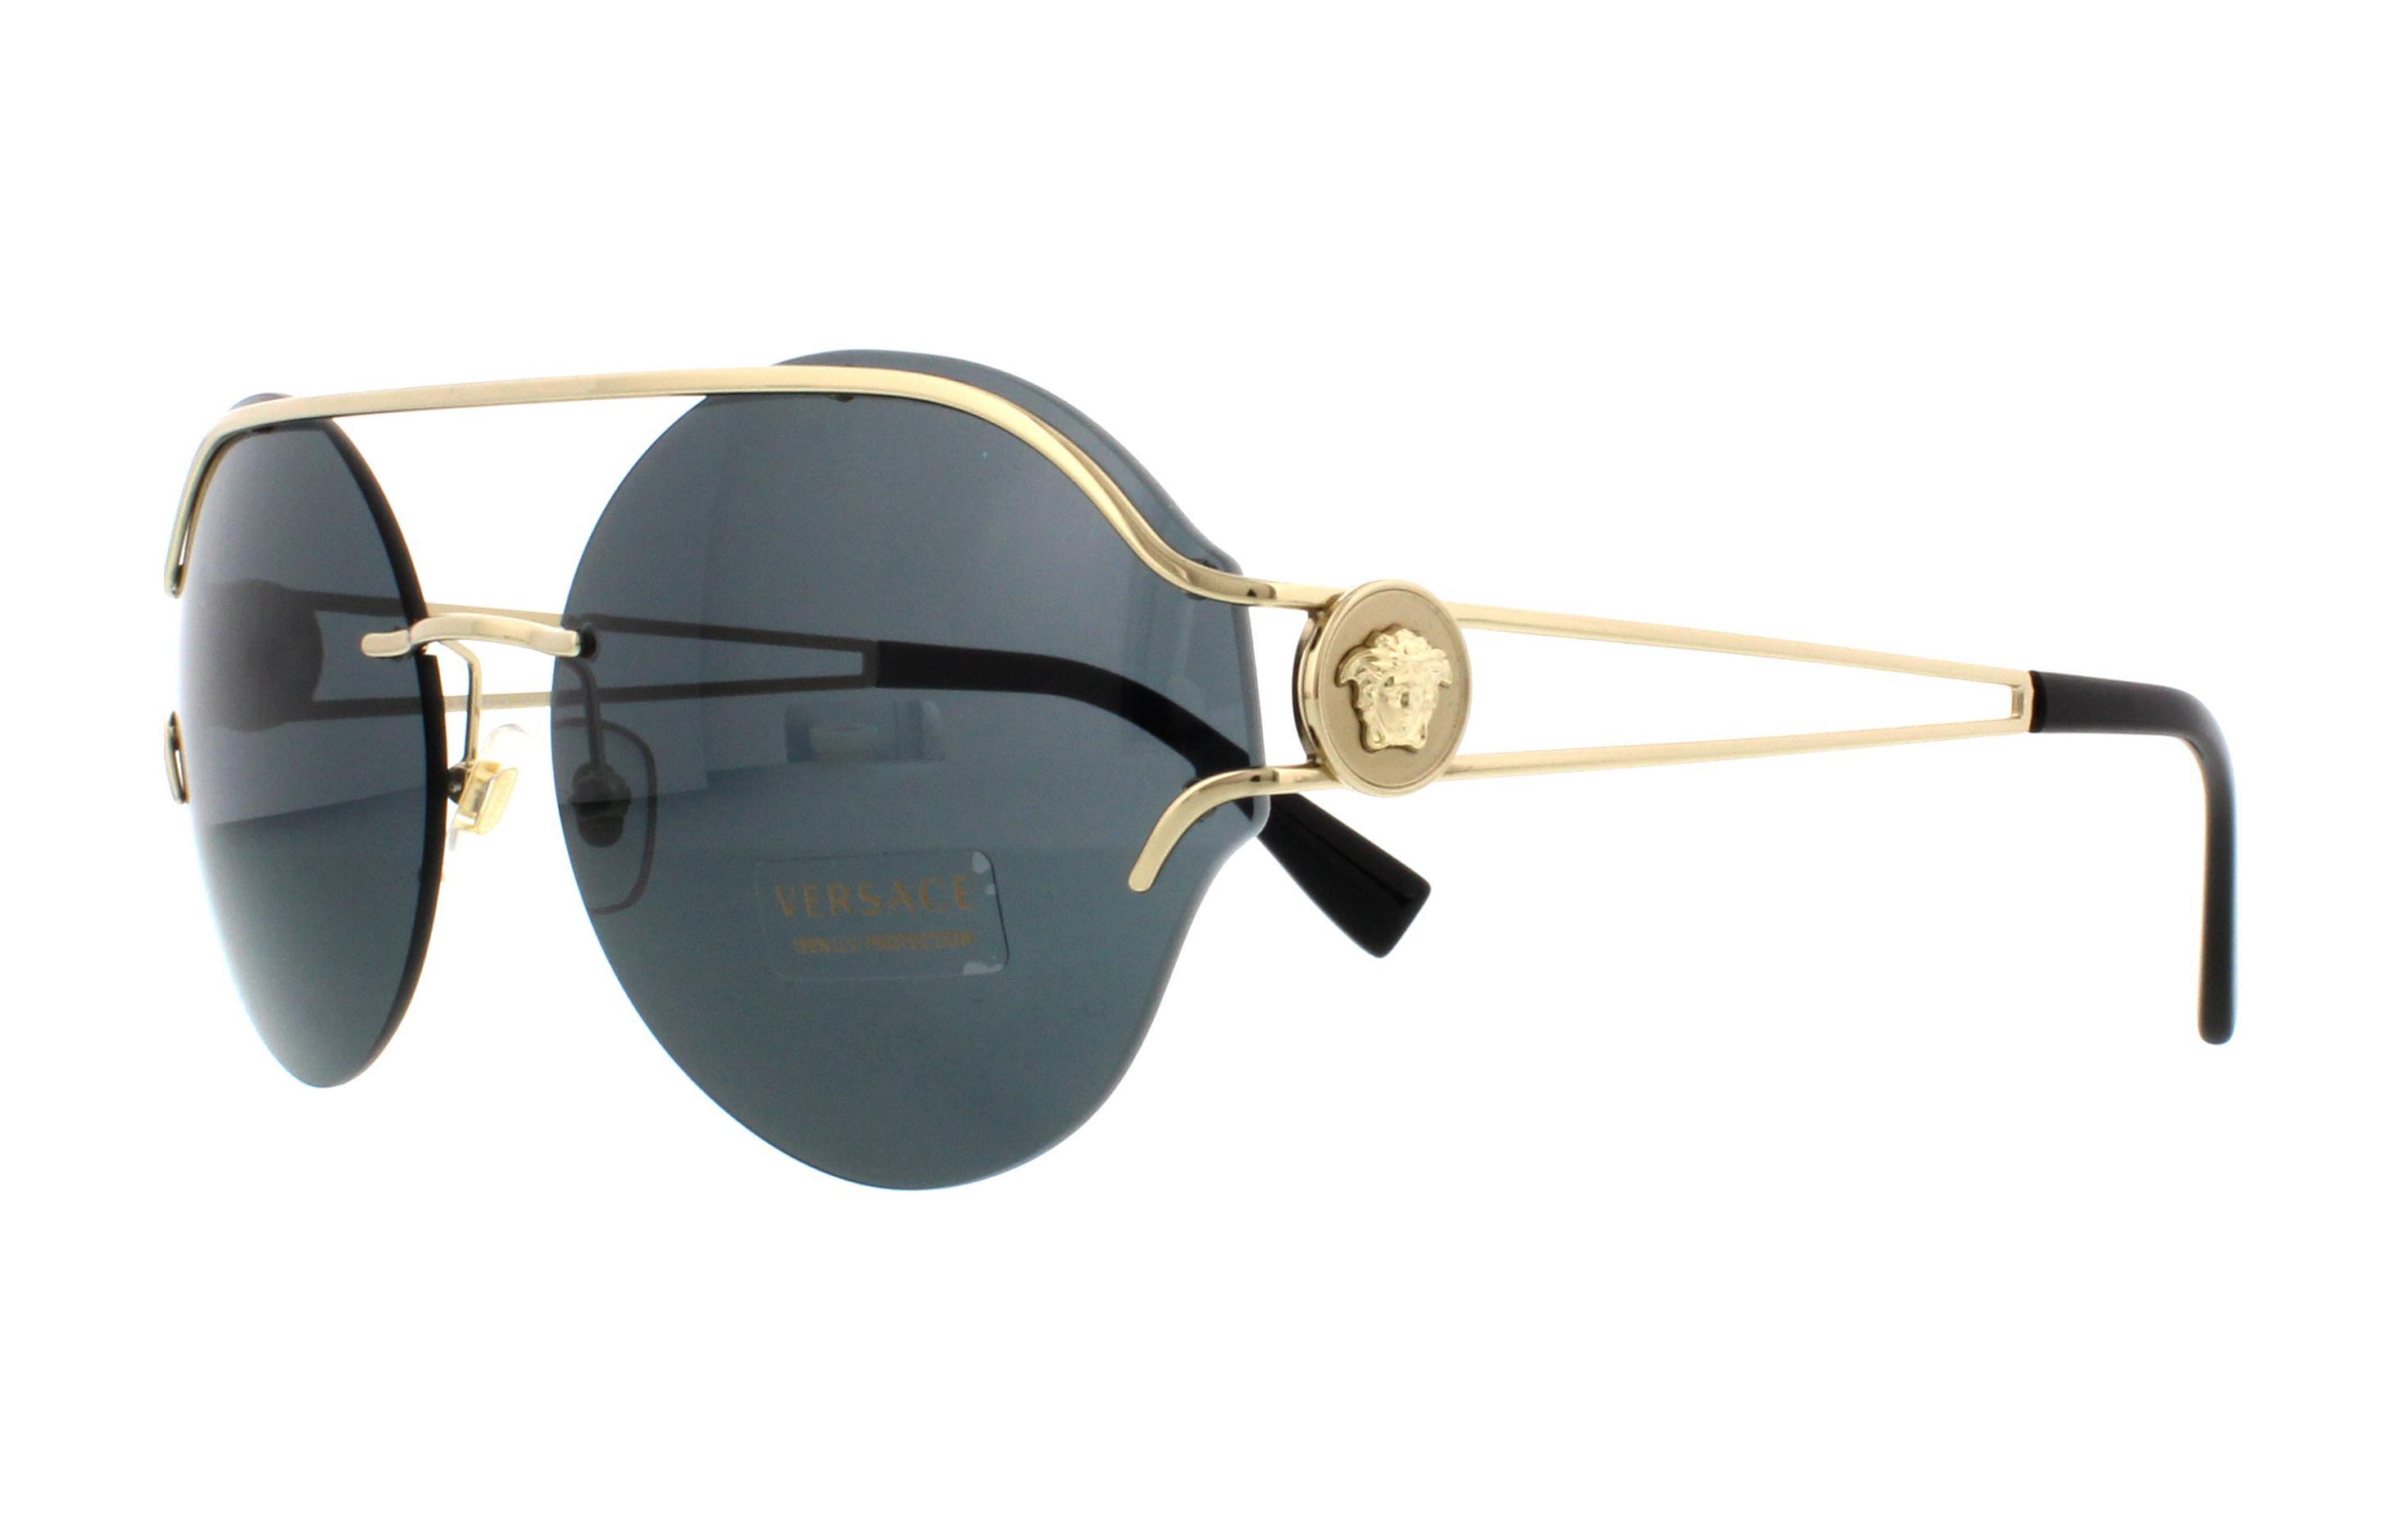 60e9132c8ca55 VERSACE Sunglasses VE2184 125287 Pale Gold 61MM 8053672800937